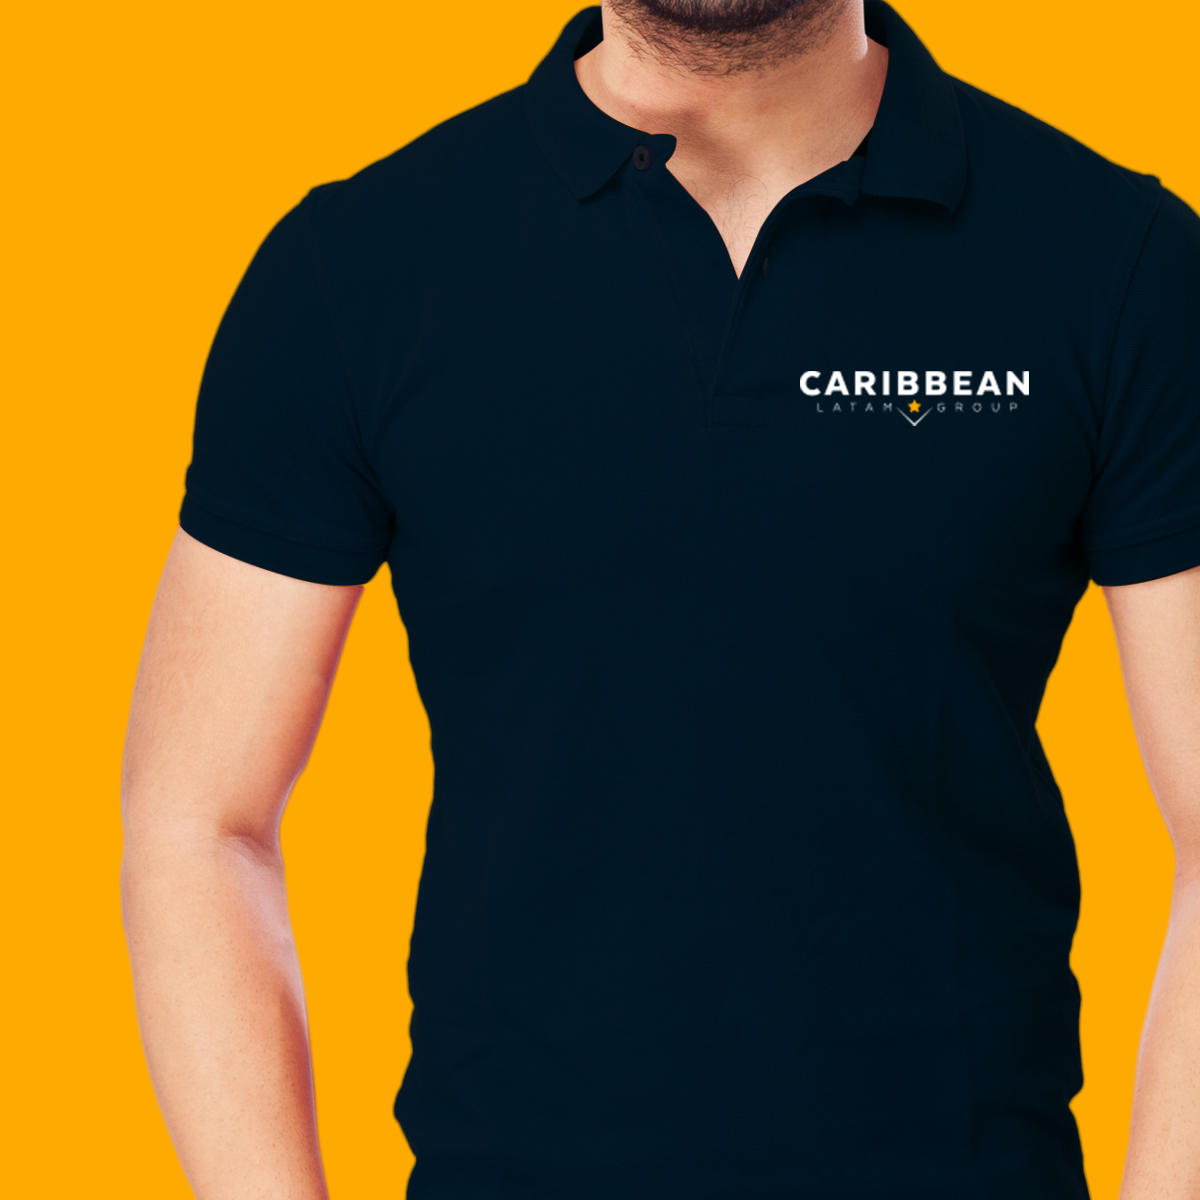 CARIBBEAN_3